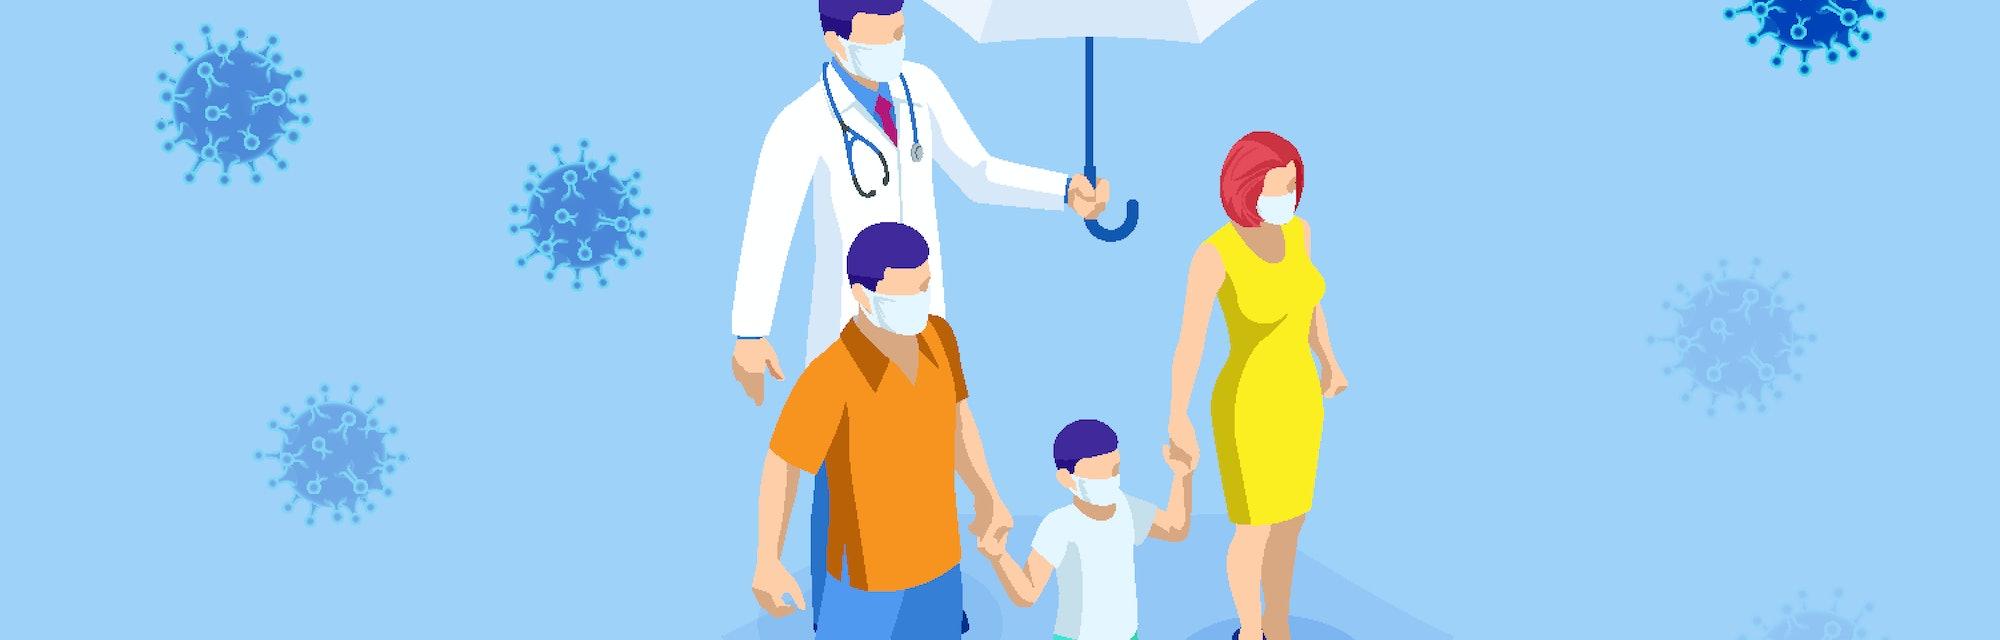 China battles Coronavirus outbreak. Coronavirus 2019-nC0V Outbreak, Travel Alert concept. The virus attacks the respiratory tract, pandemic medical health risk